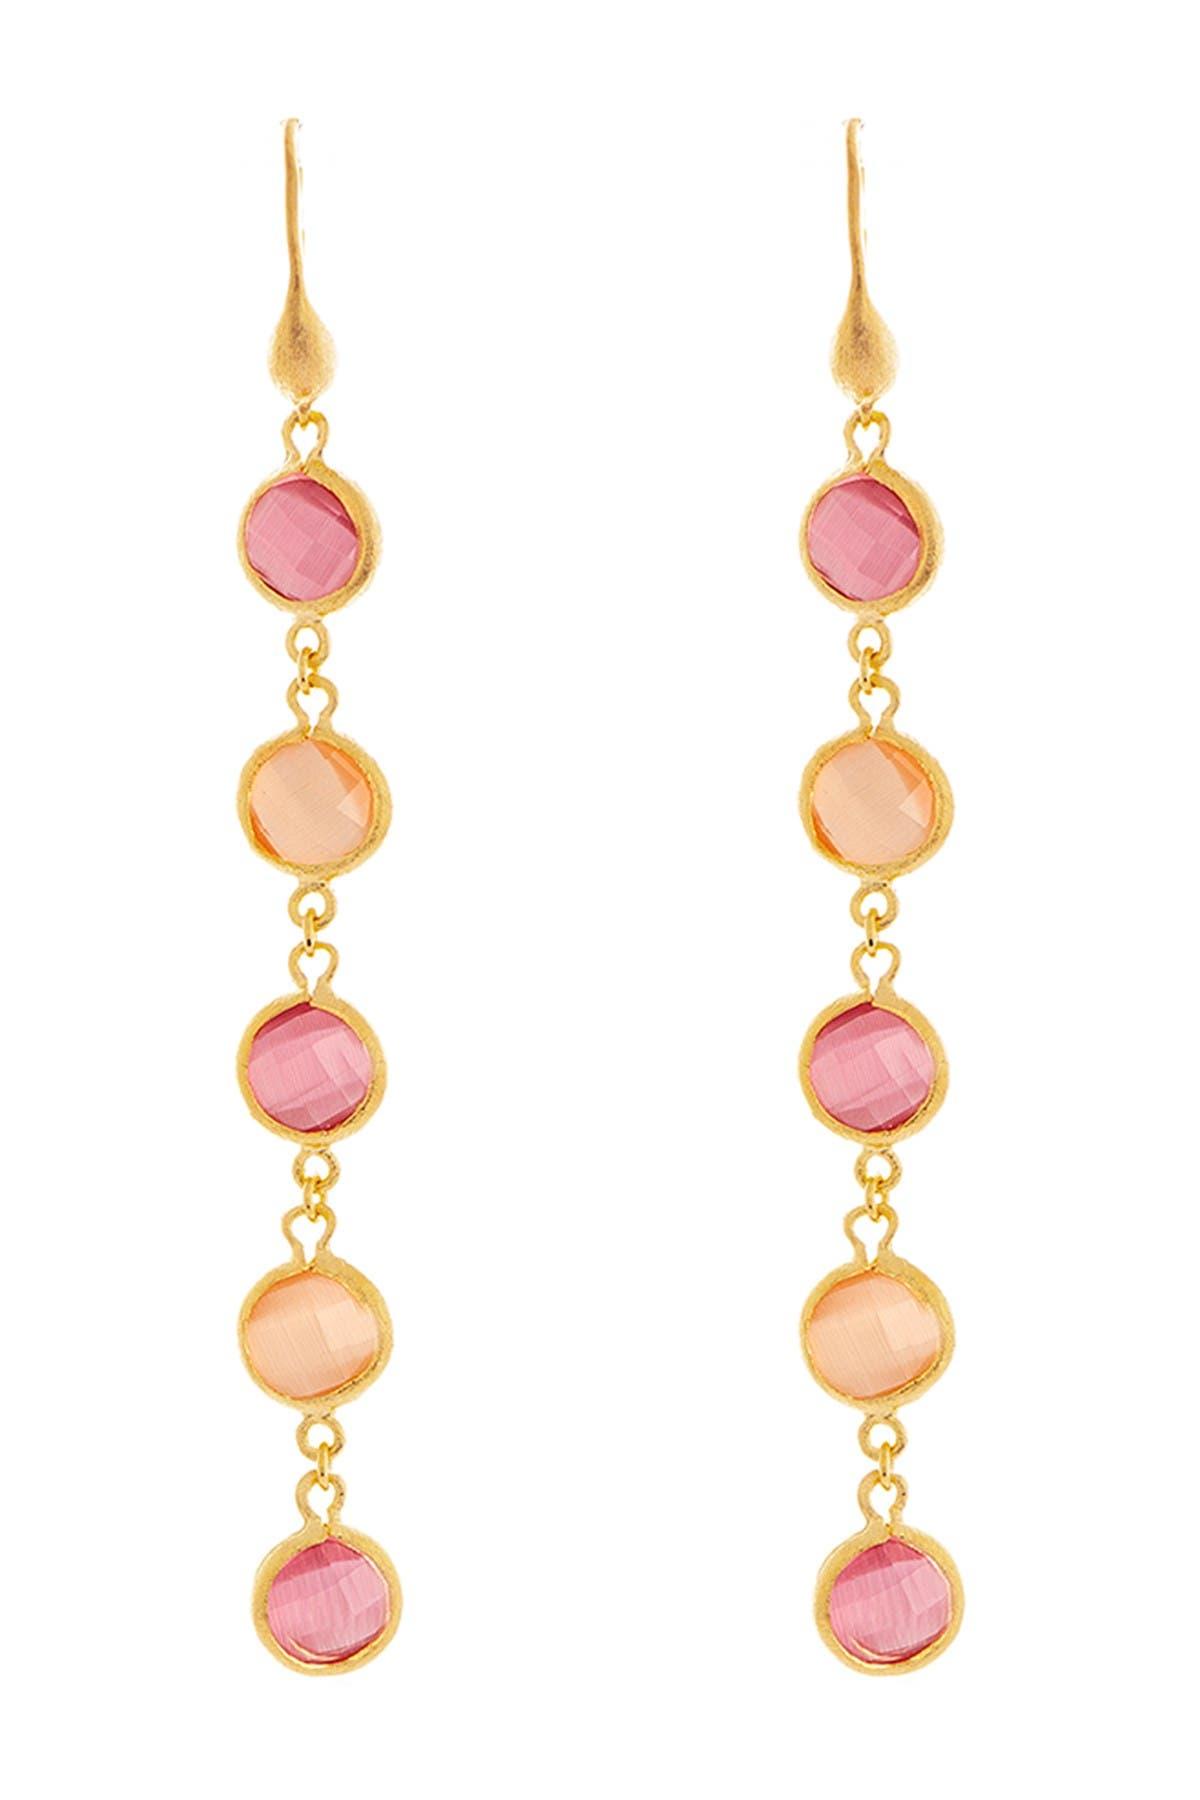 Image of Rivka Friedman 18K Gold Clad Crystal Cascading Dangle Earrings